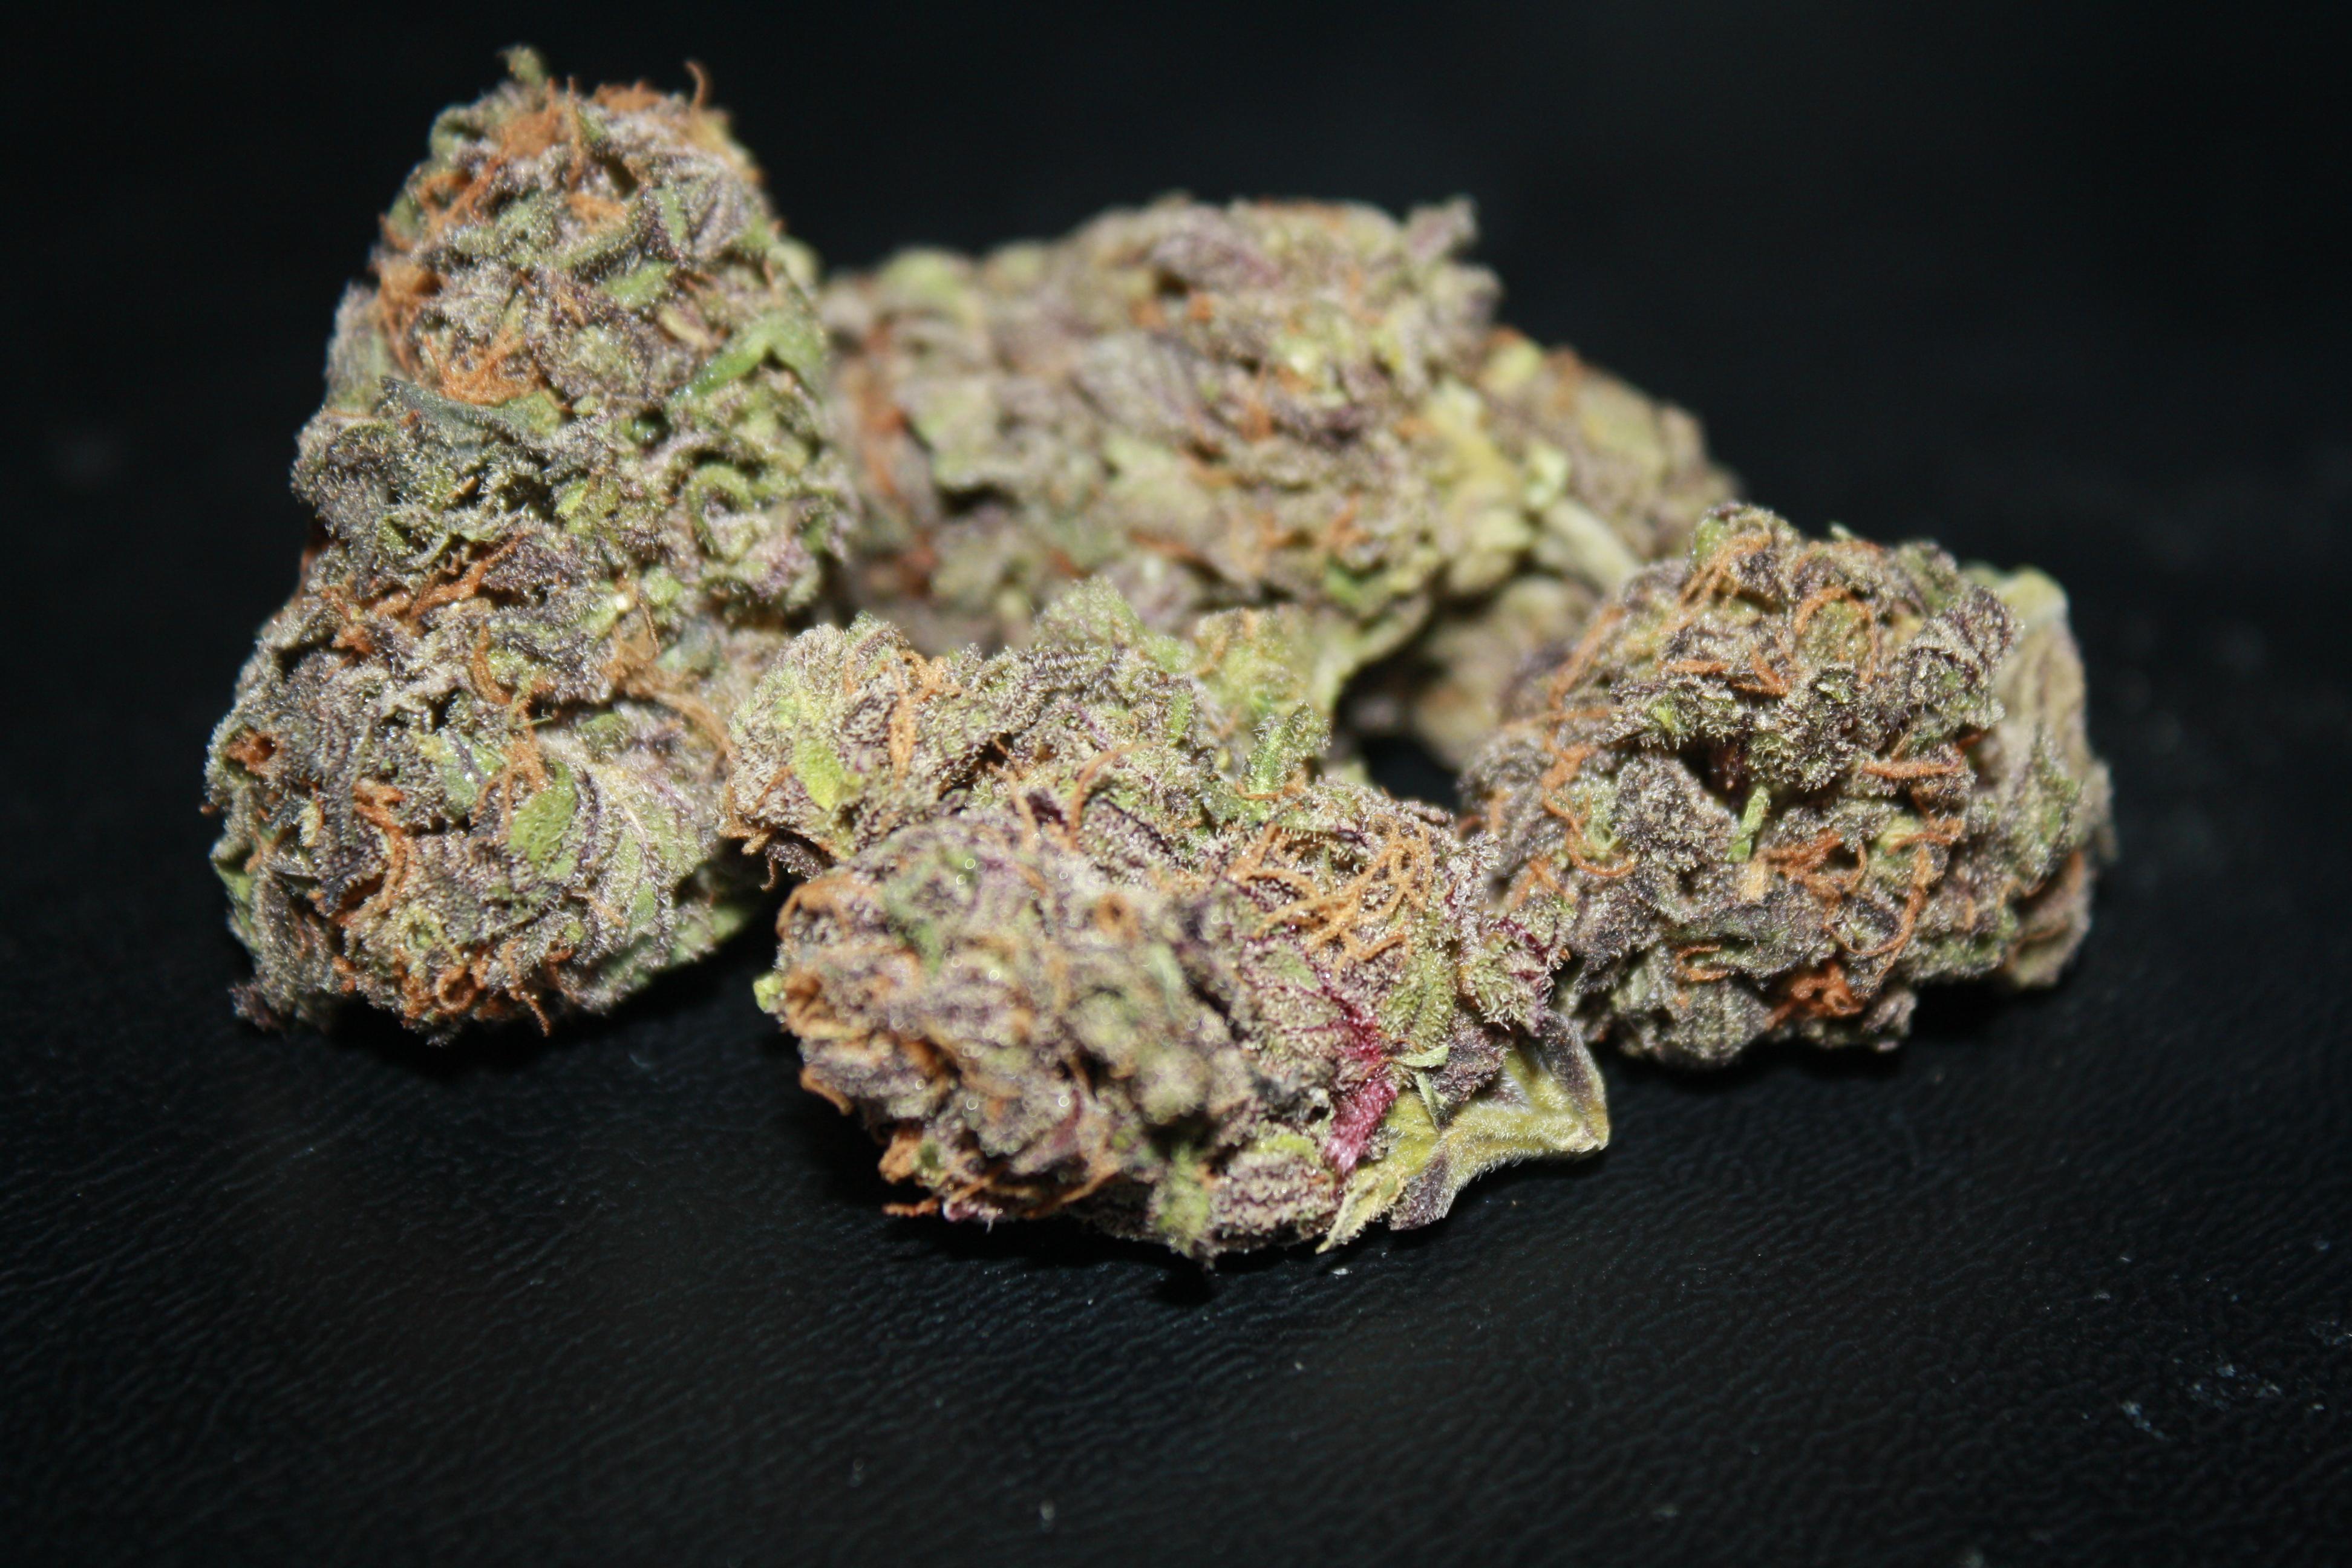 Purple Gorilla Weed is The Purple Gorilla